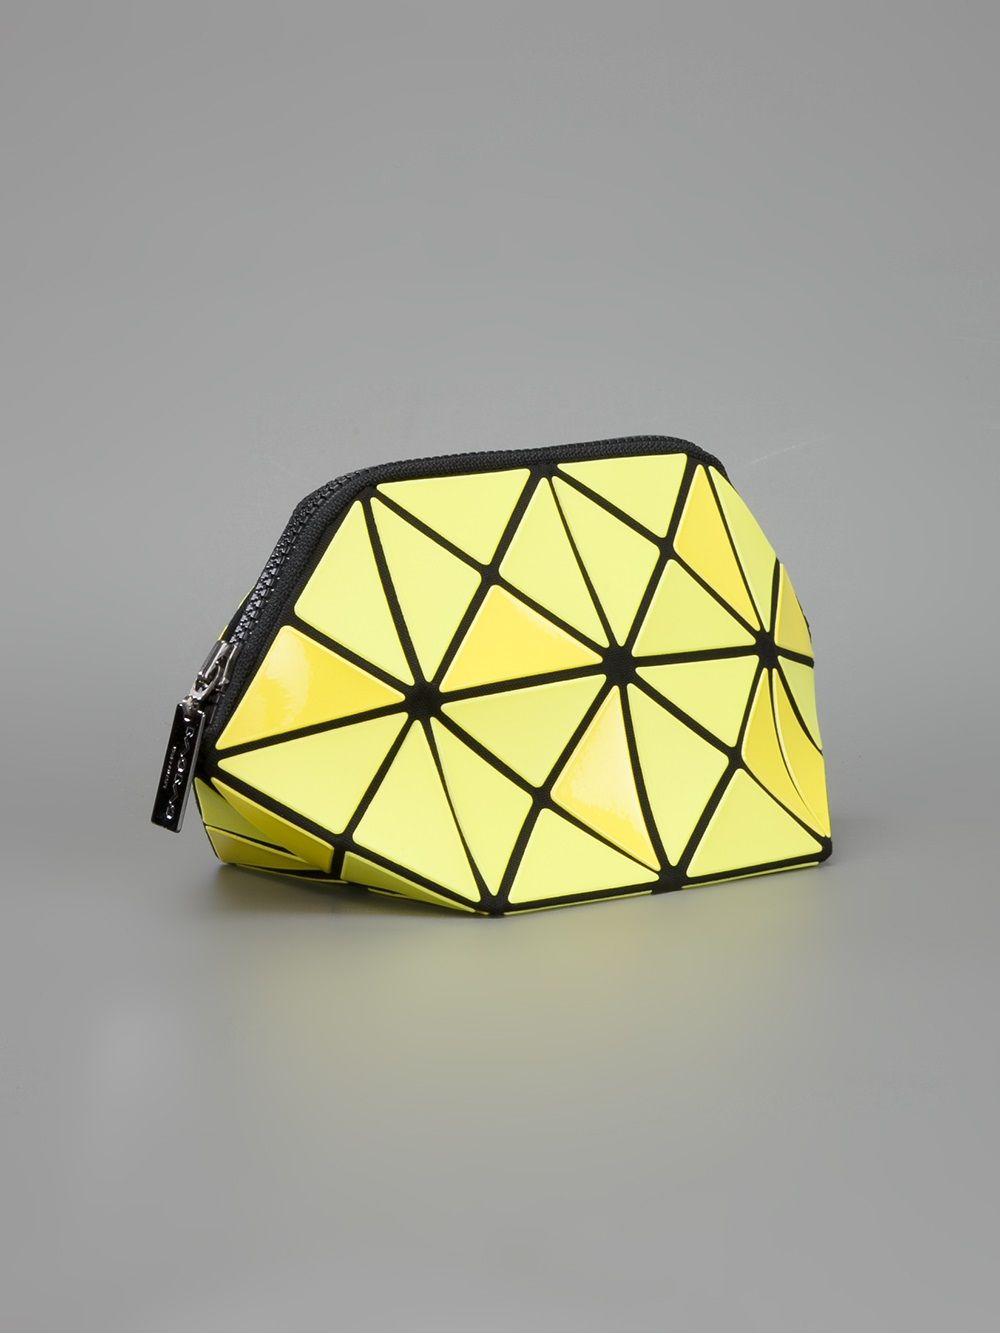 Bao Bao Issey Miyake Geometric Paneled Clutch - Bernardelli - Farfetch.com